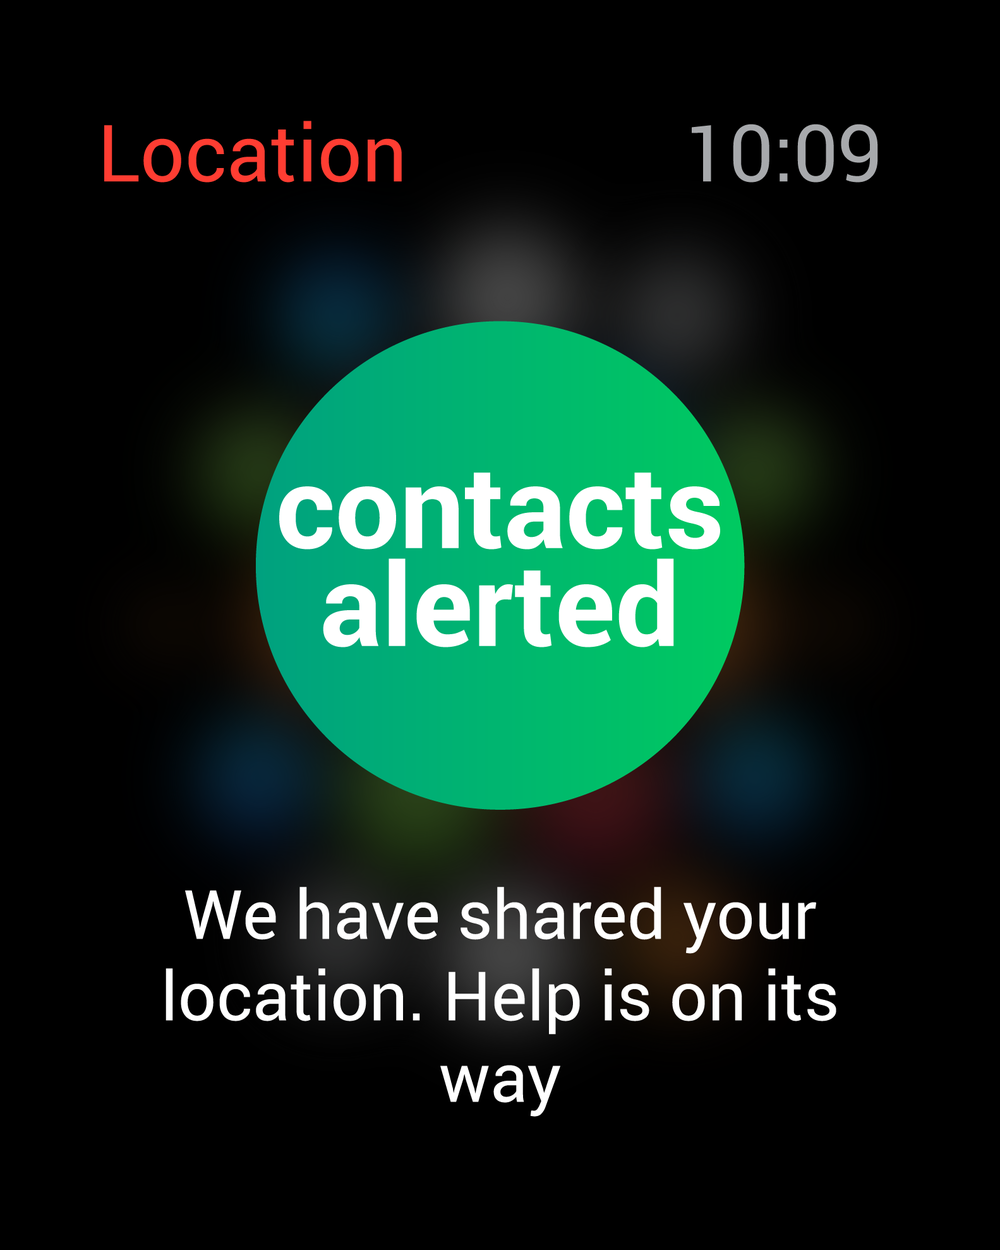 location sent